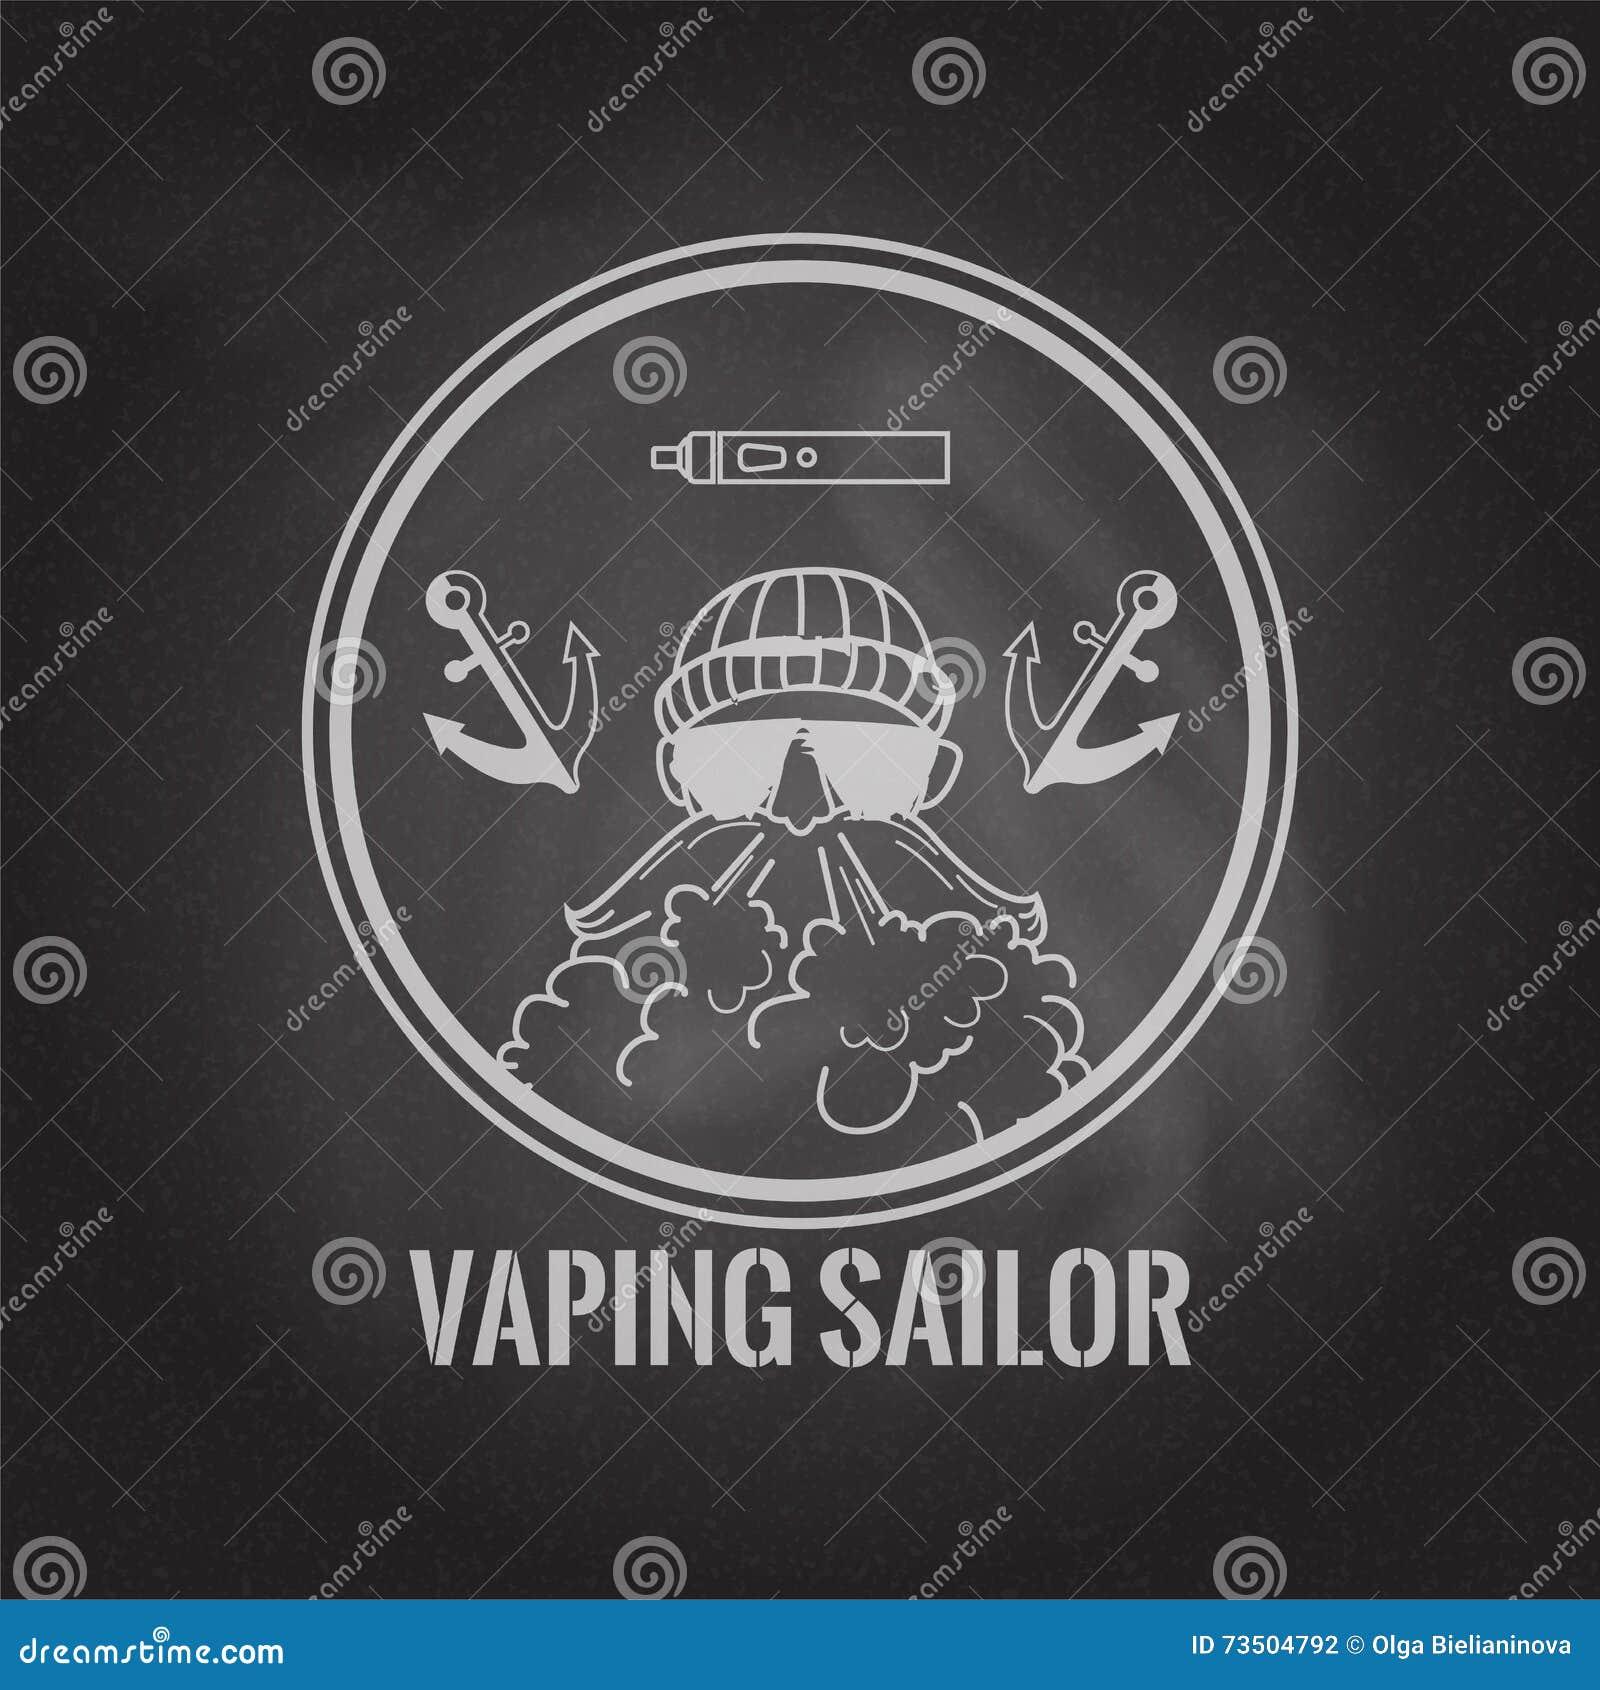 Vaping żeglarza okręgu logo z vaporiser i kotwicy na chalkboard tle